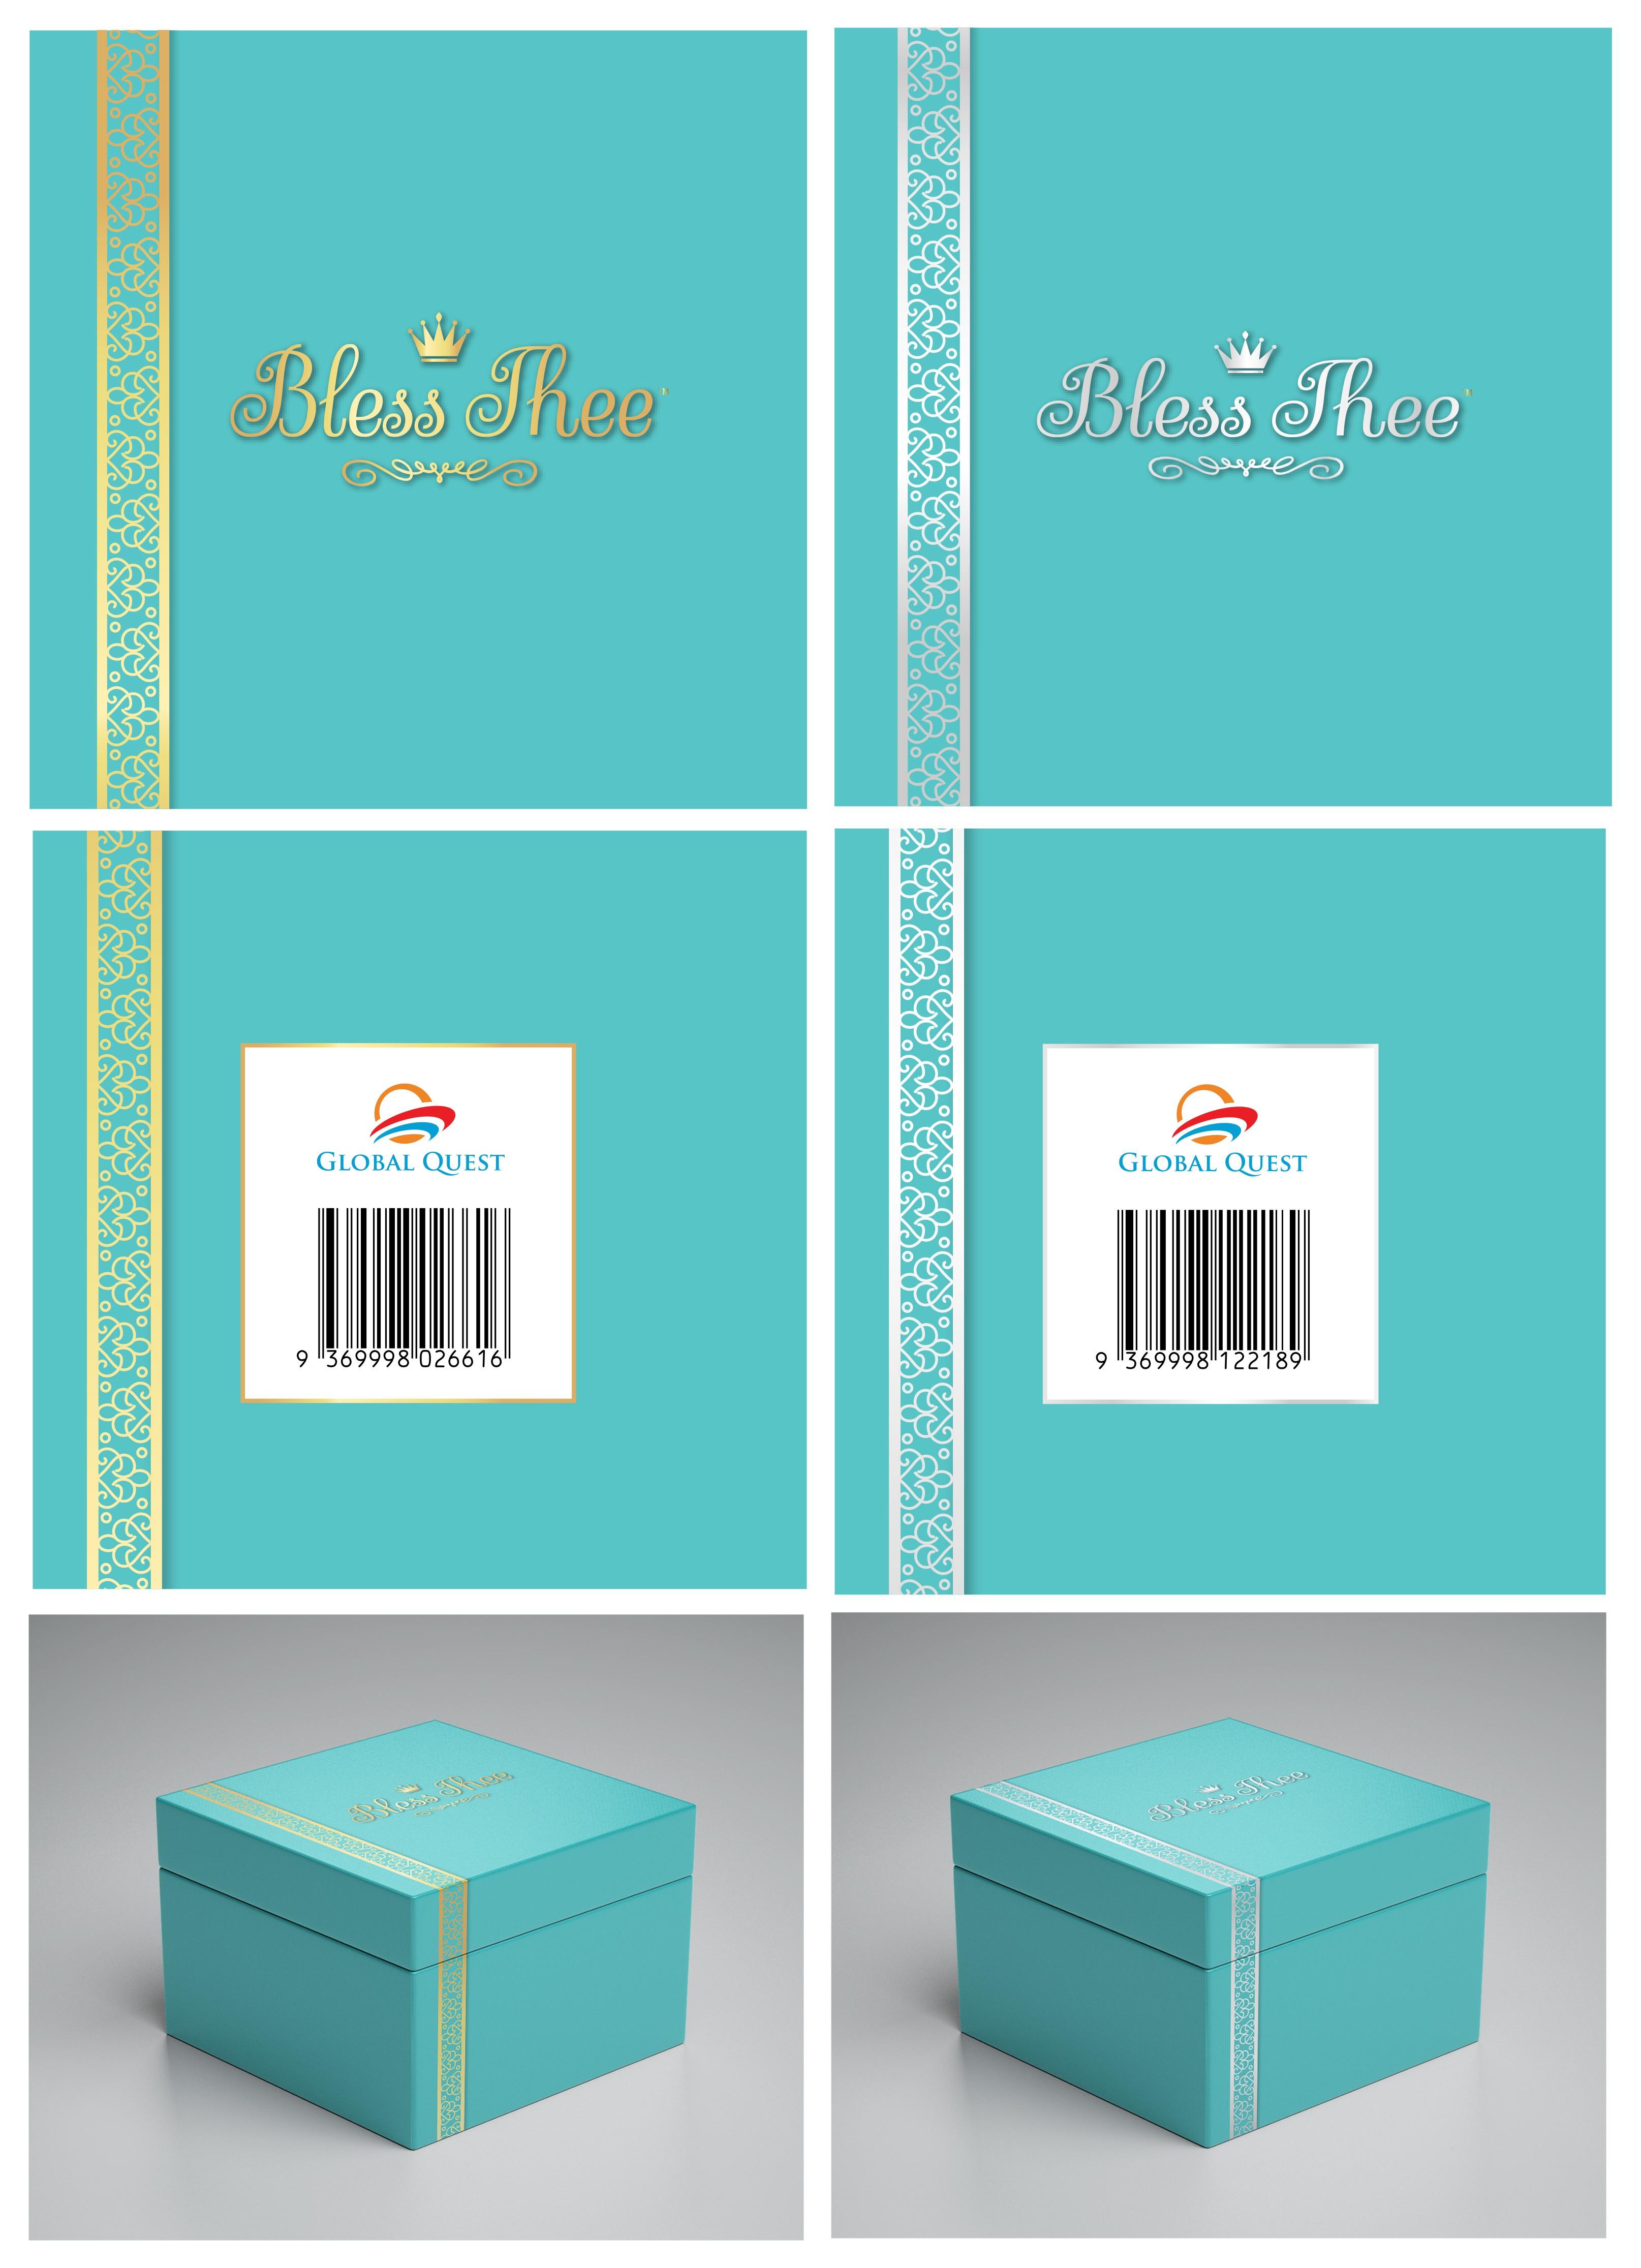 Design a Gift Box for a Crown Cake Topper - weddings, birthdays, births